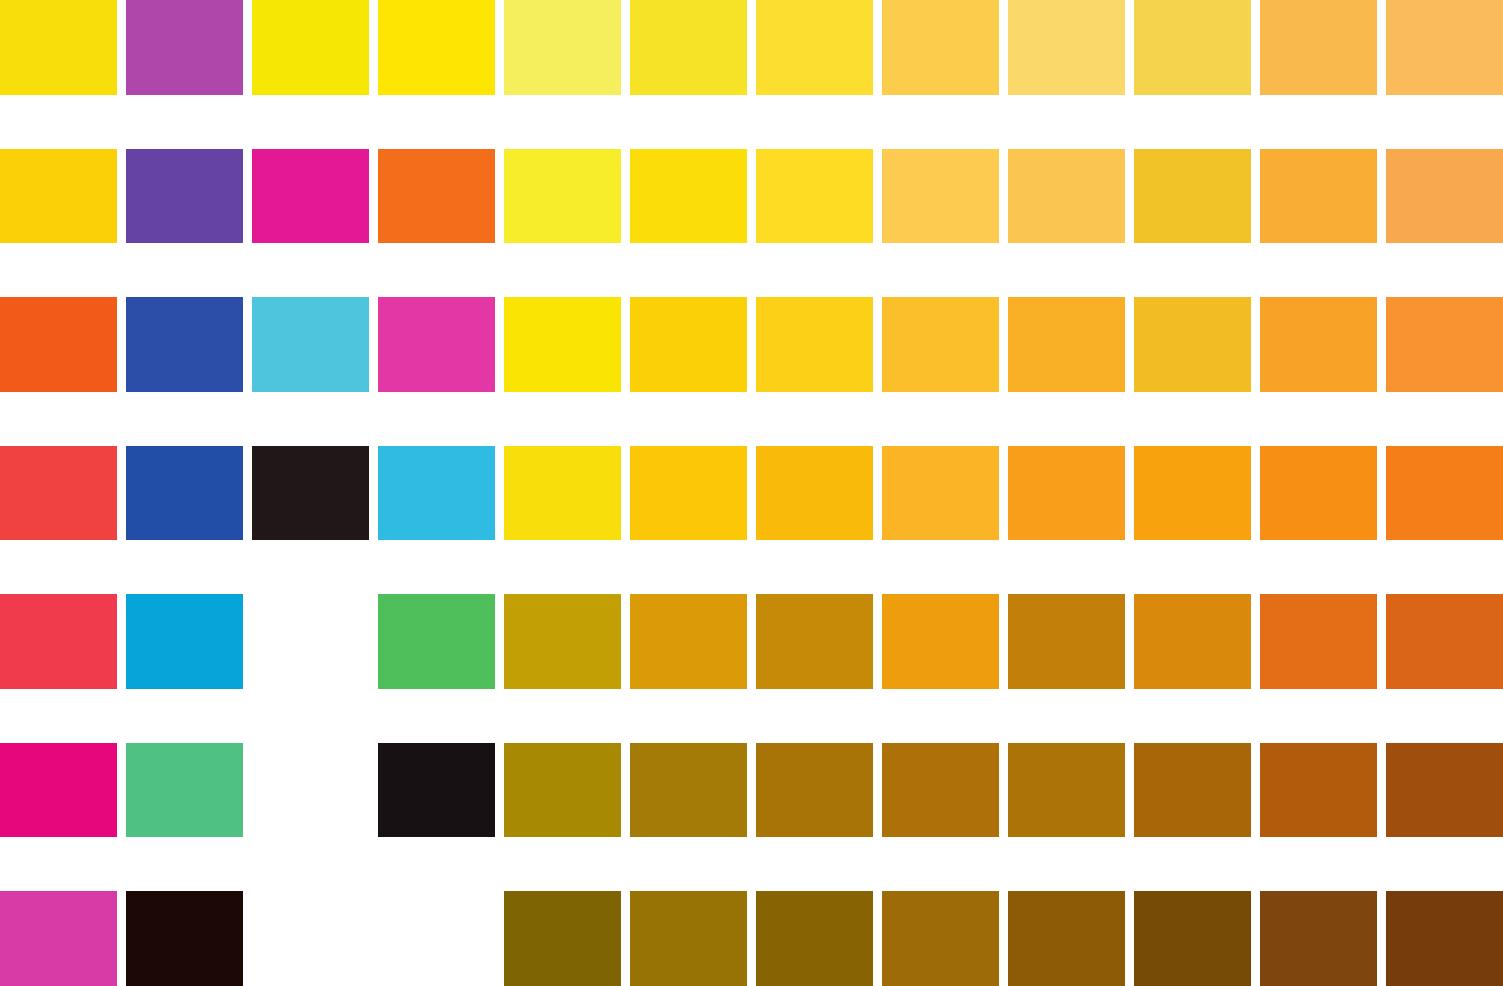 Free Pantone Color Chart Pdf 68kb 14 Page S Pantone Color Chart Pantone Chart Pantone Color